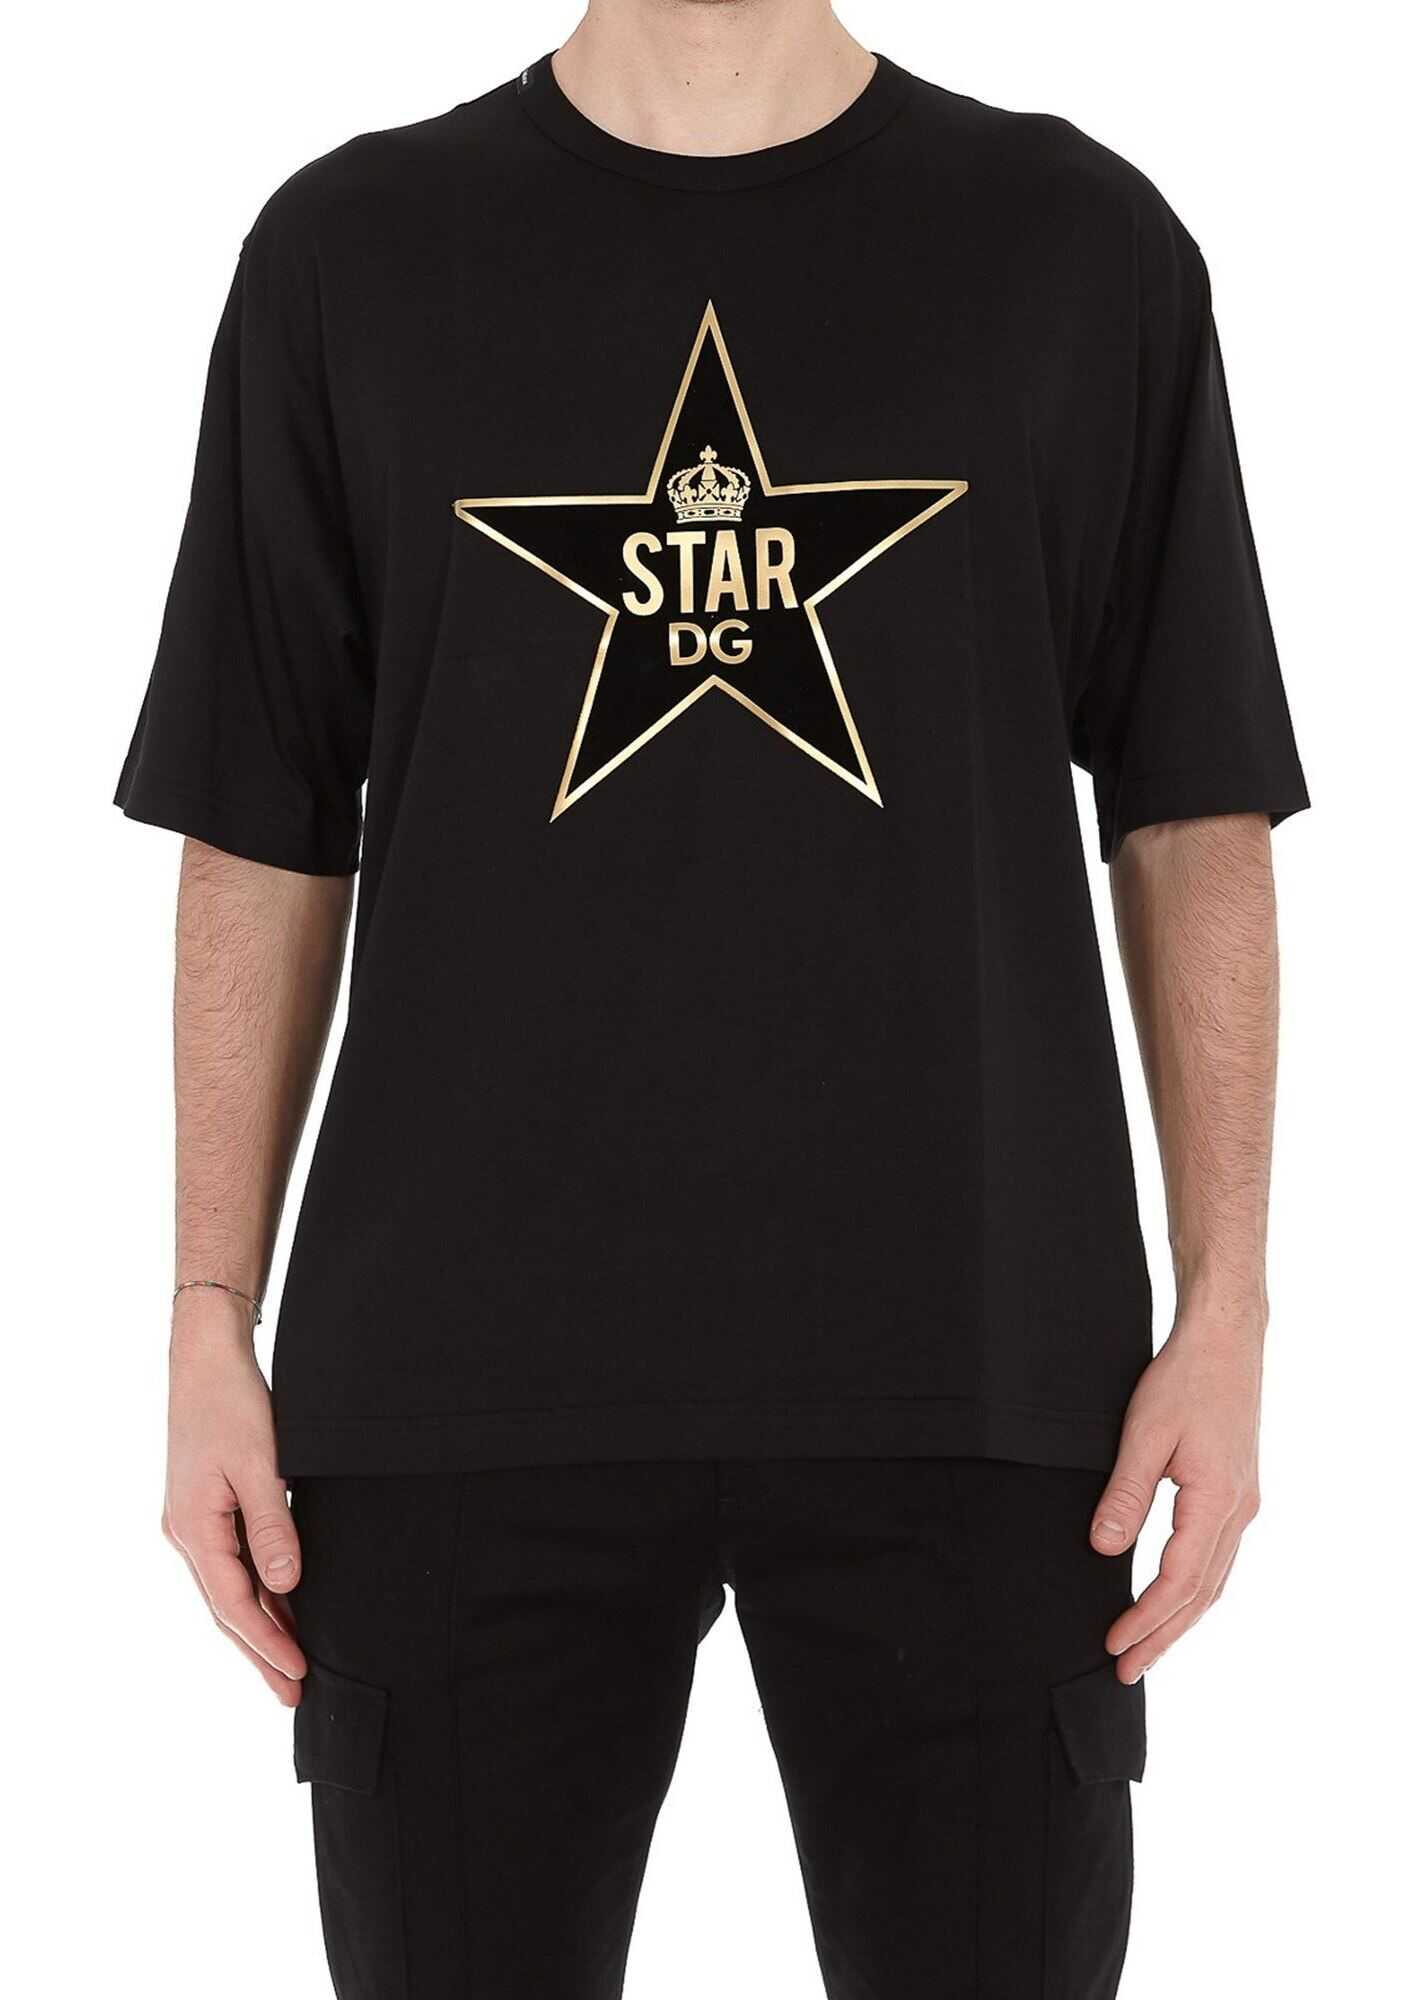 Dolce & Gabbana Star Dg Patch T-Shirt Black